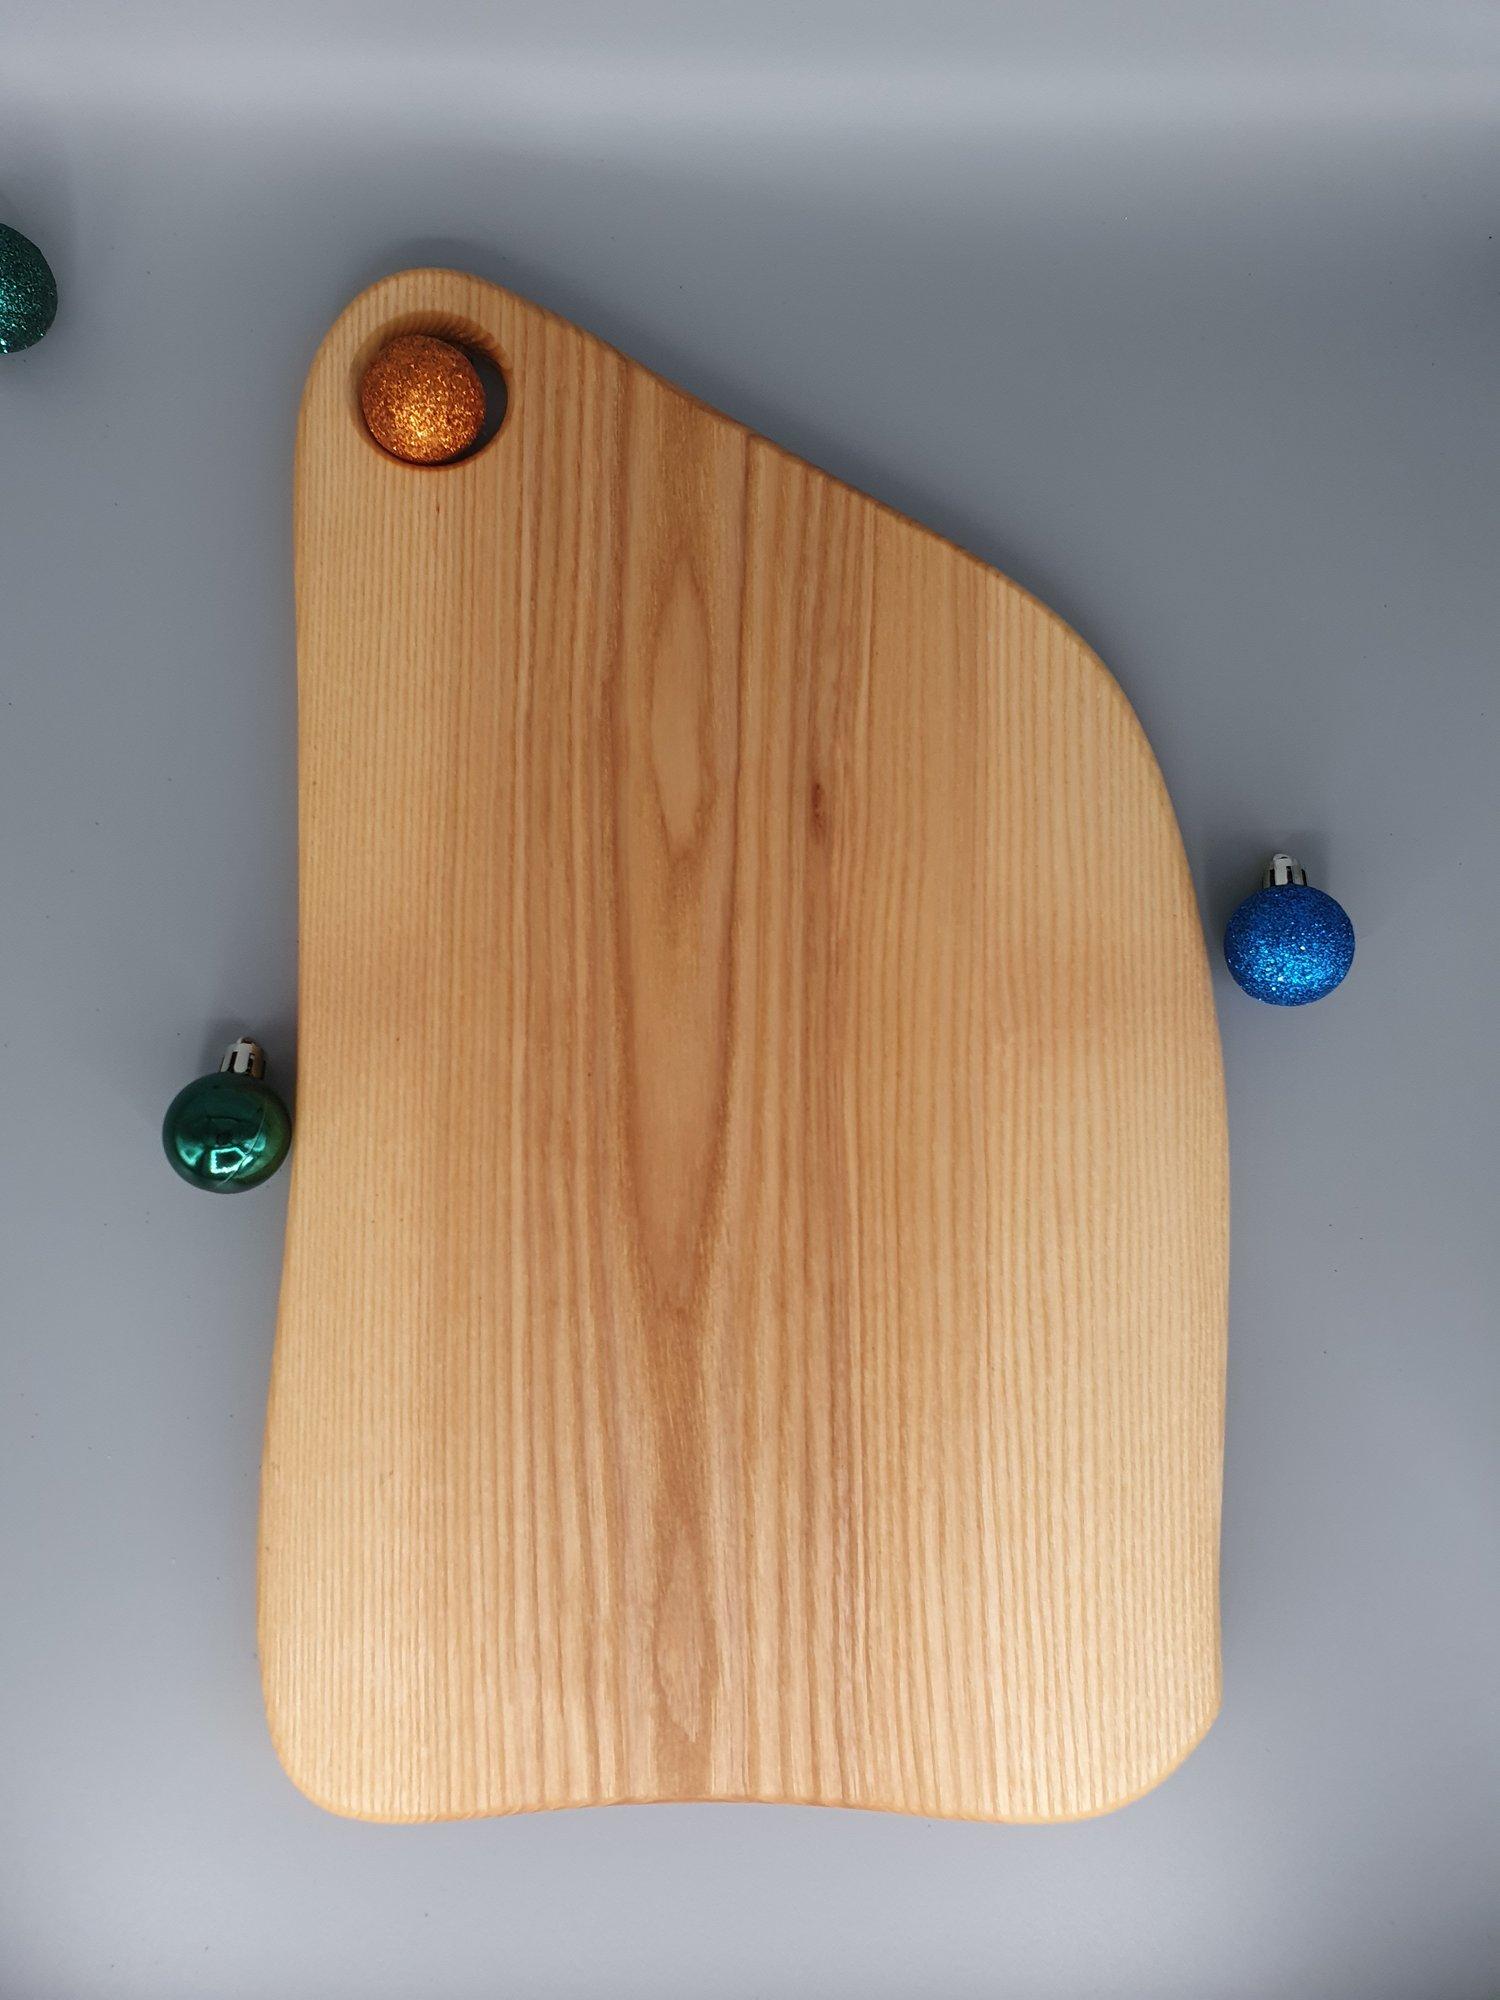 Image of Handy board